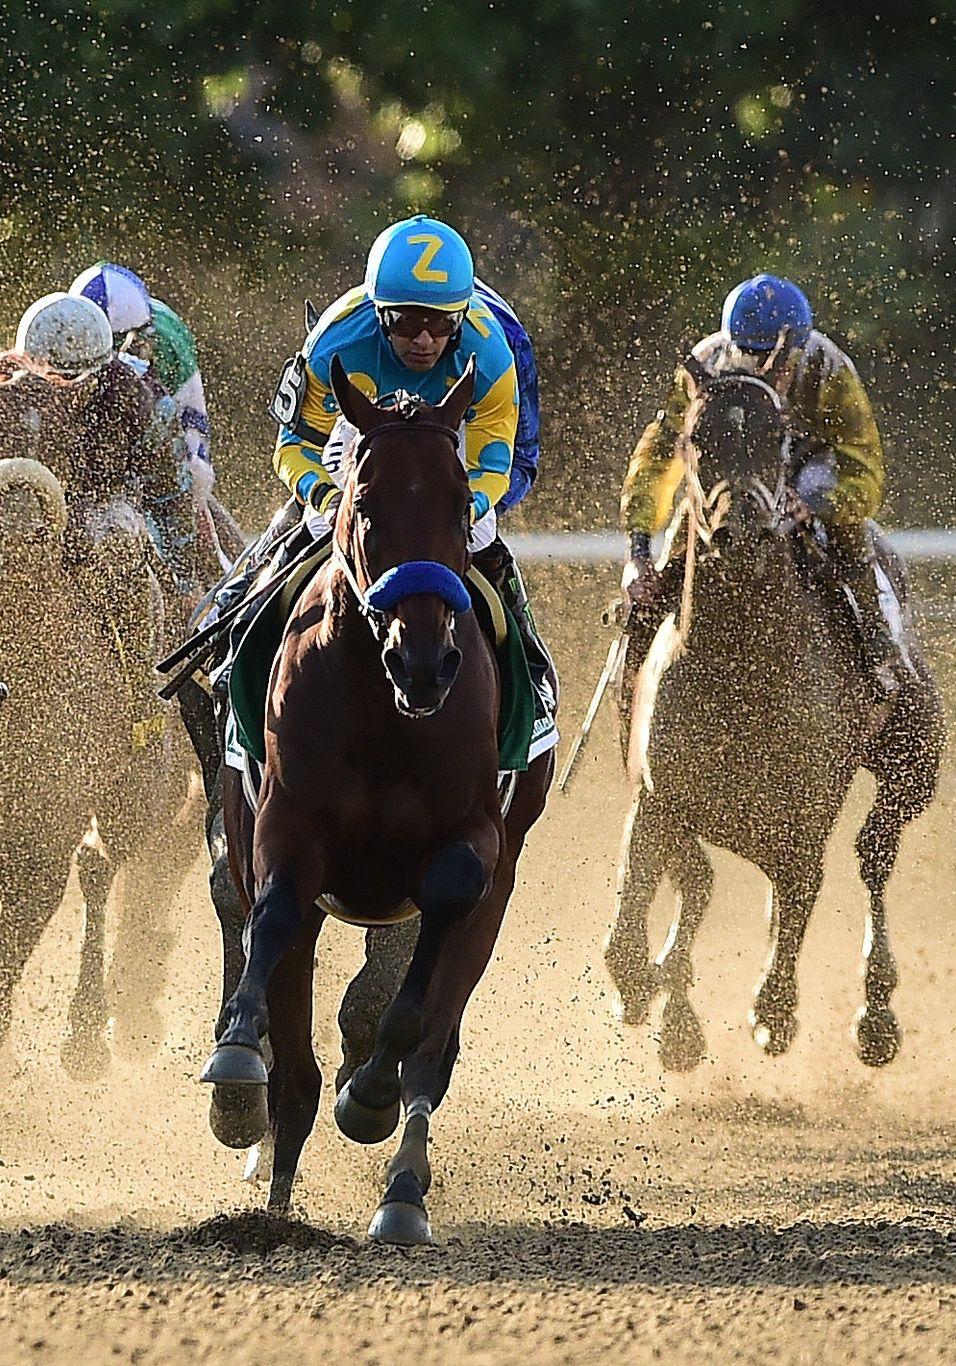 American Pharoah running in the Belmont Stakes horse race ...  American Pharoa...